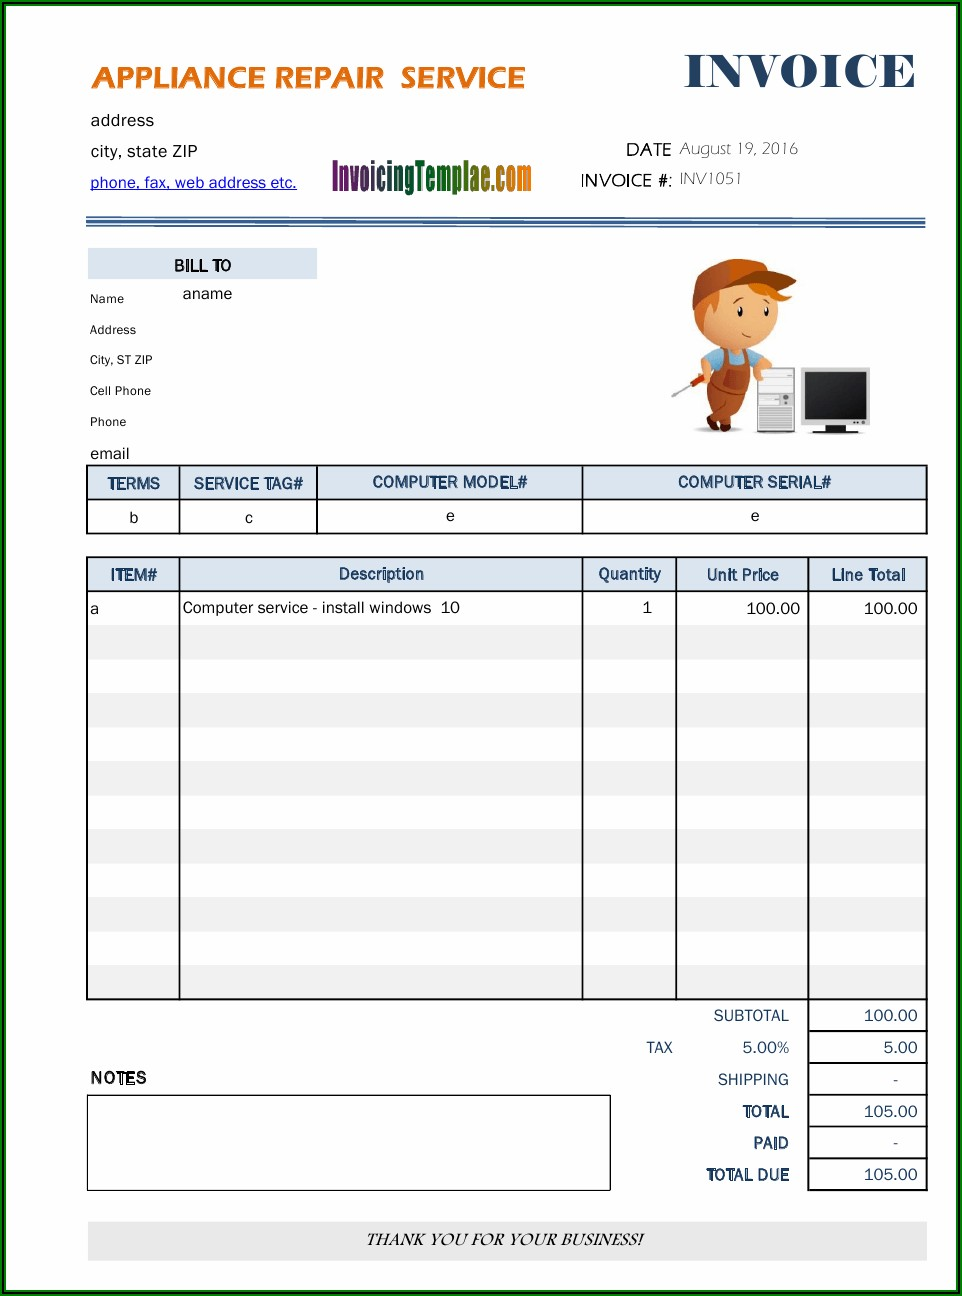 Appliance Service Invoice Template